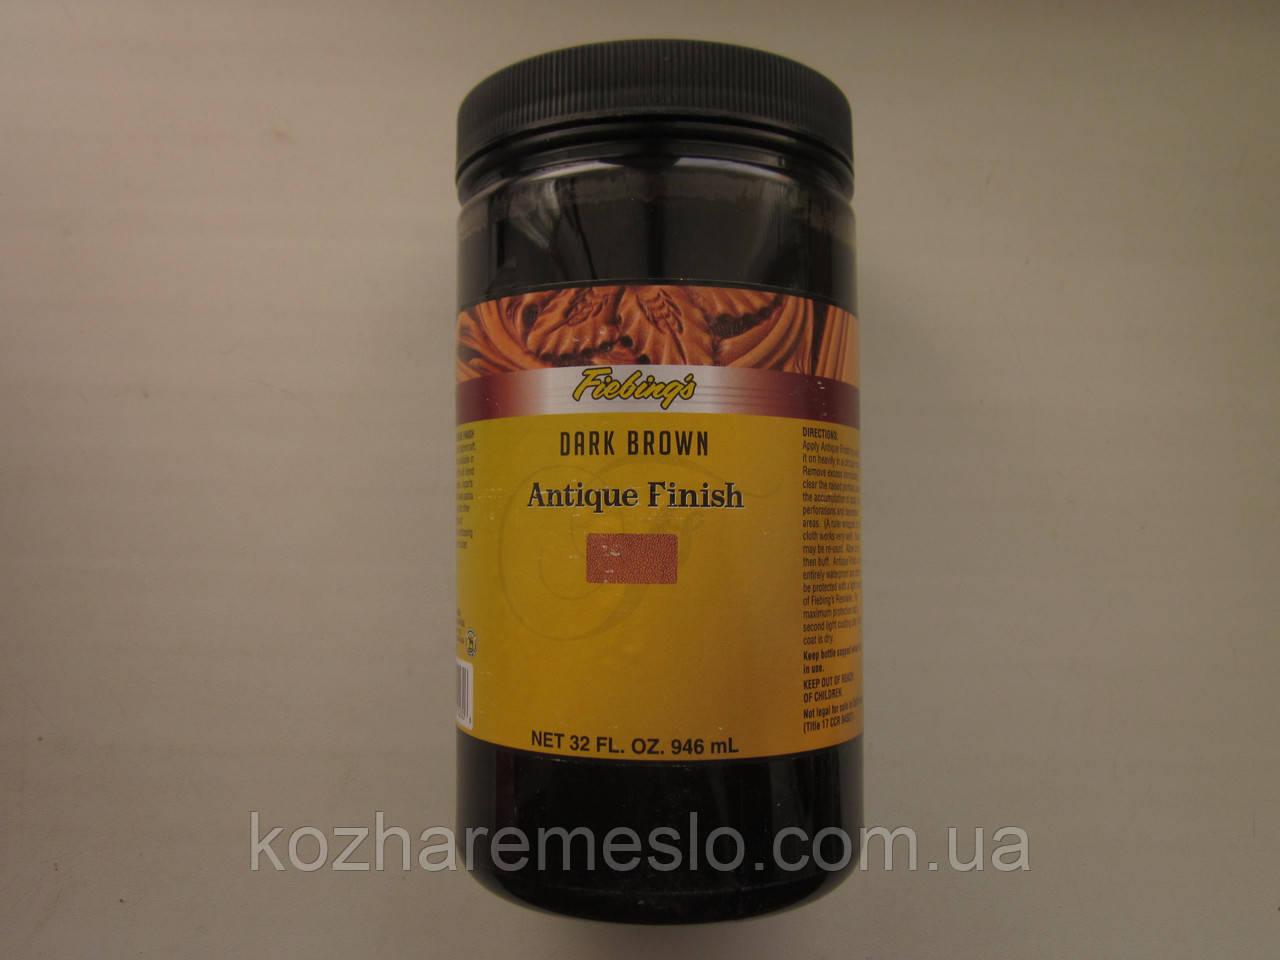 Антик - финиш FIEBING'S для кожи 100 гр тёмно - коричневый (не фирменная упаковка)